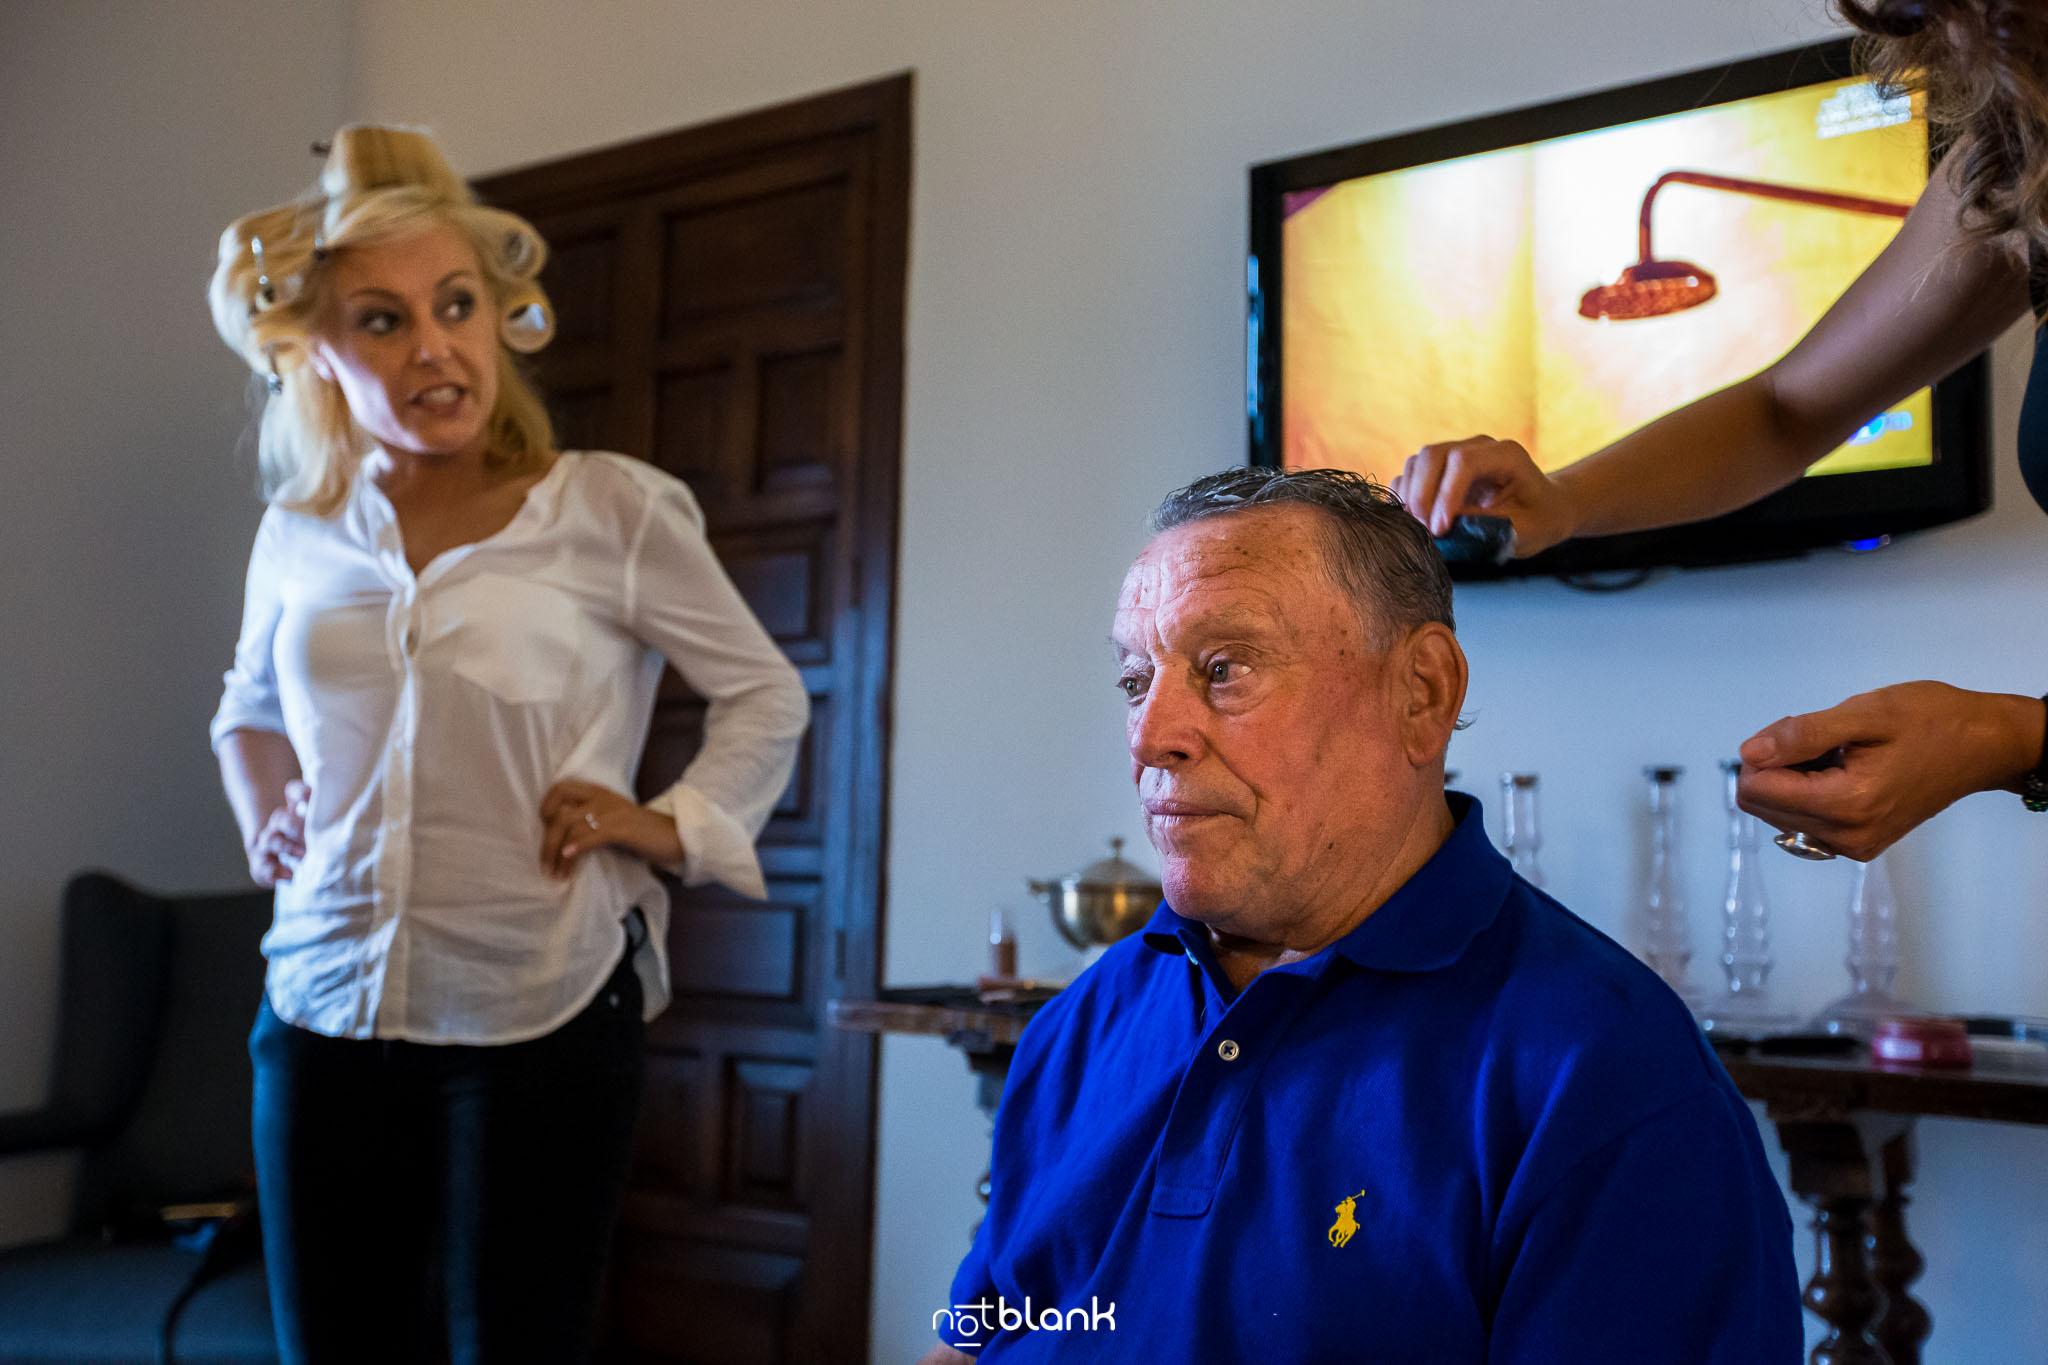 Boda Parador Baiona-Bayona-Fotógrafo de boda-Novia-Padre-Padrino-Preparativos-Peluquera-Televisión-Ducha